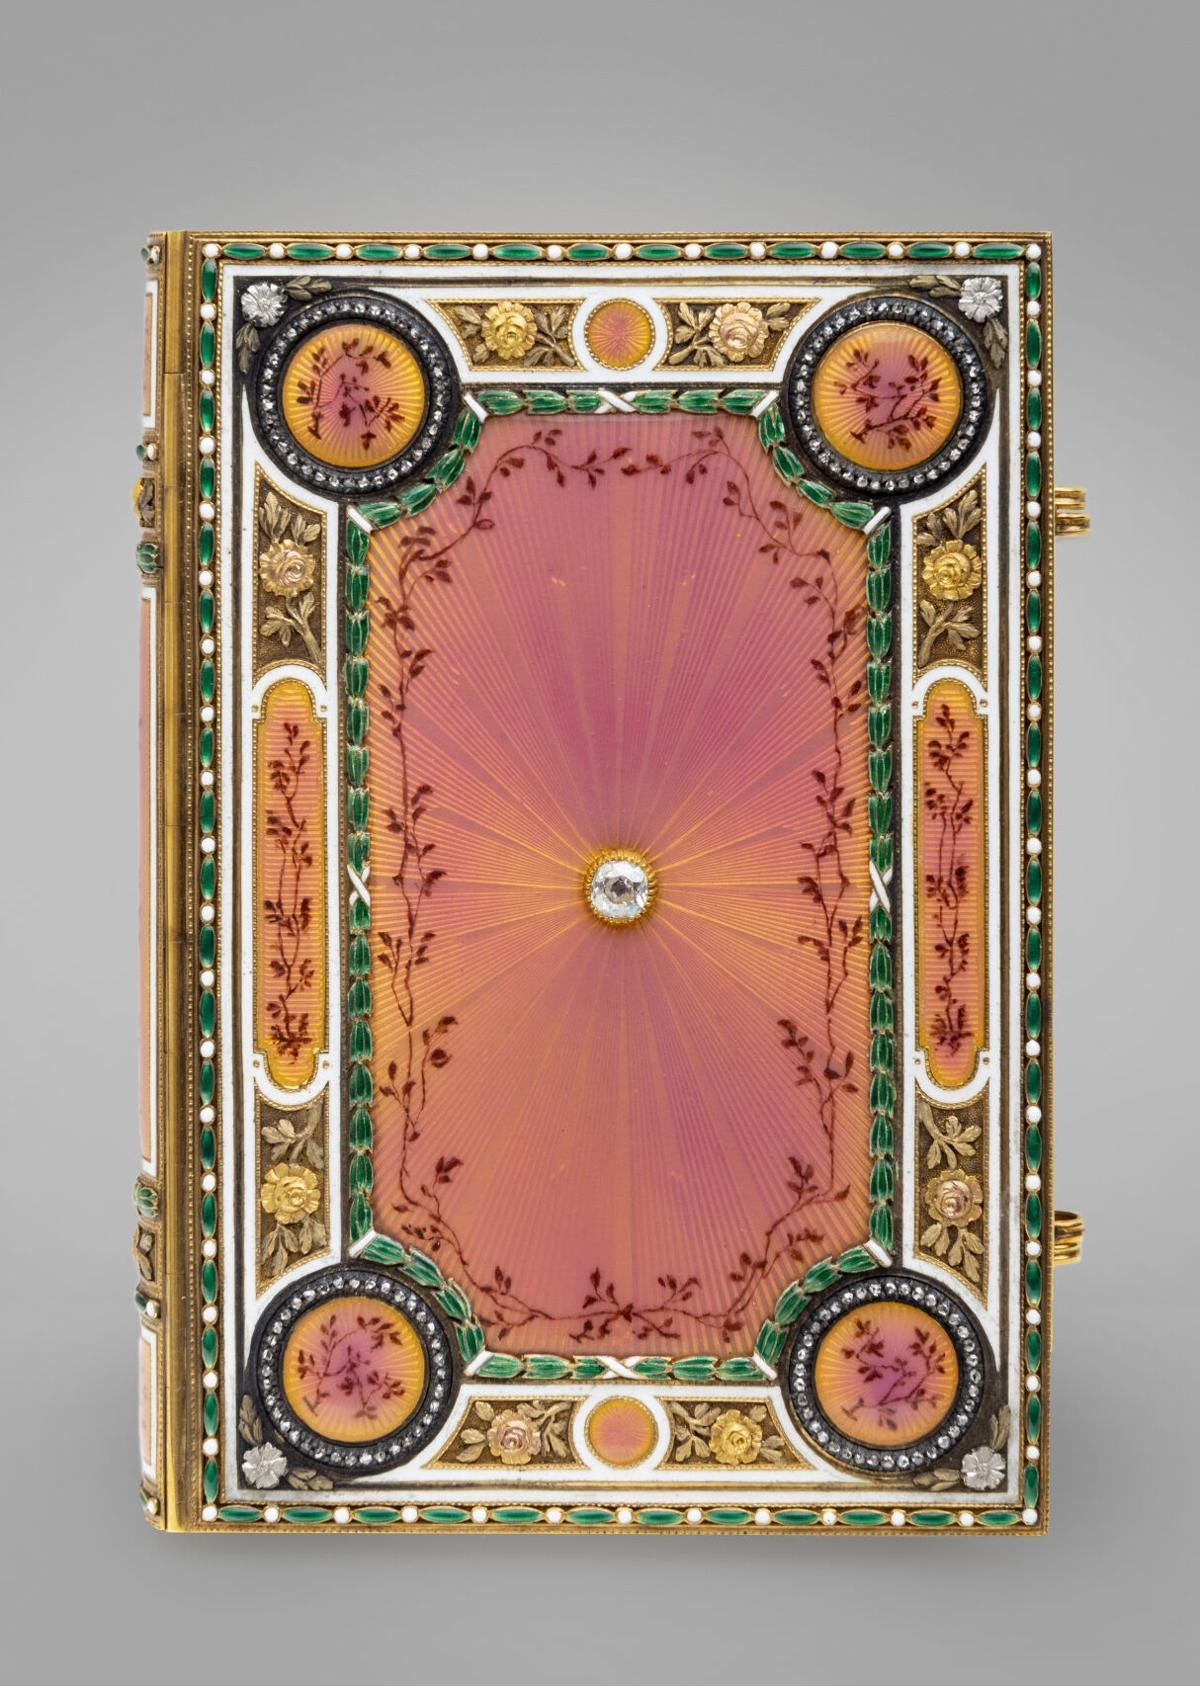 House of Faberge and Mikhail Perkhin - Notebook 1932.121_TMA.jpg